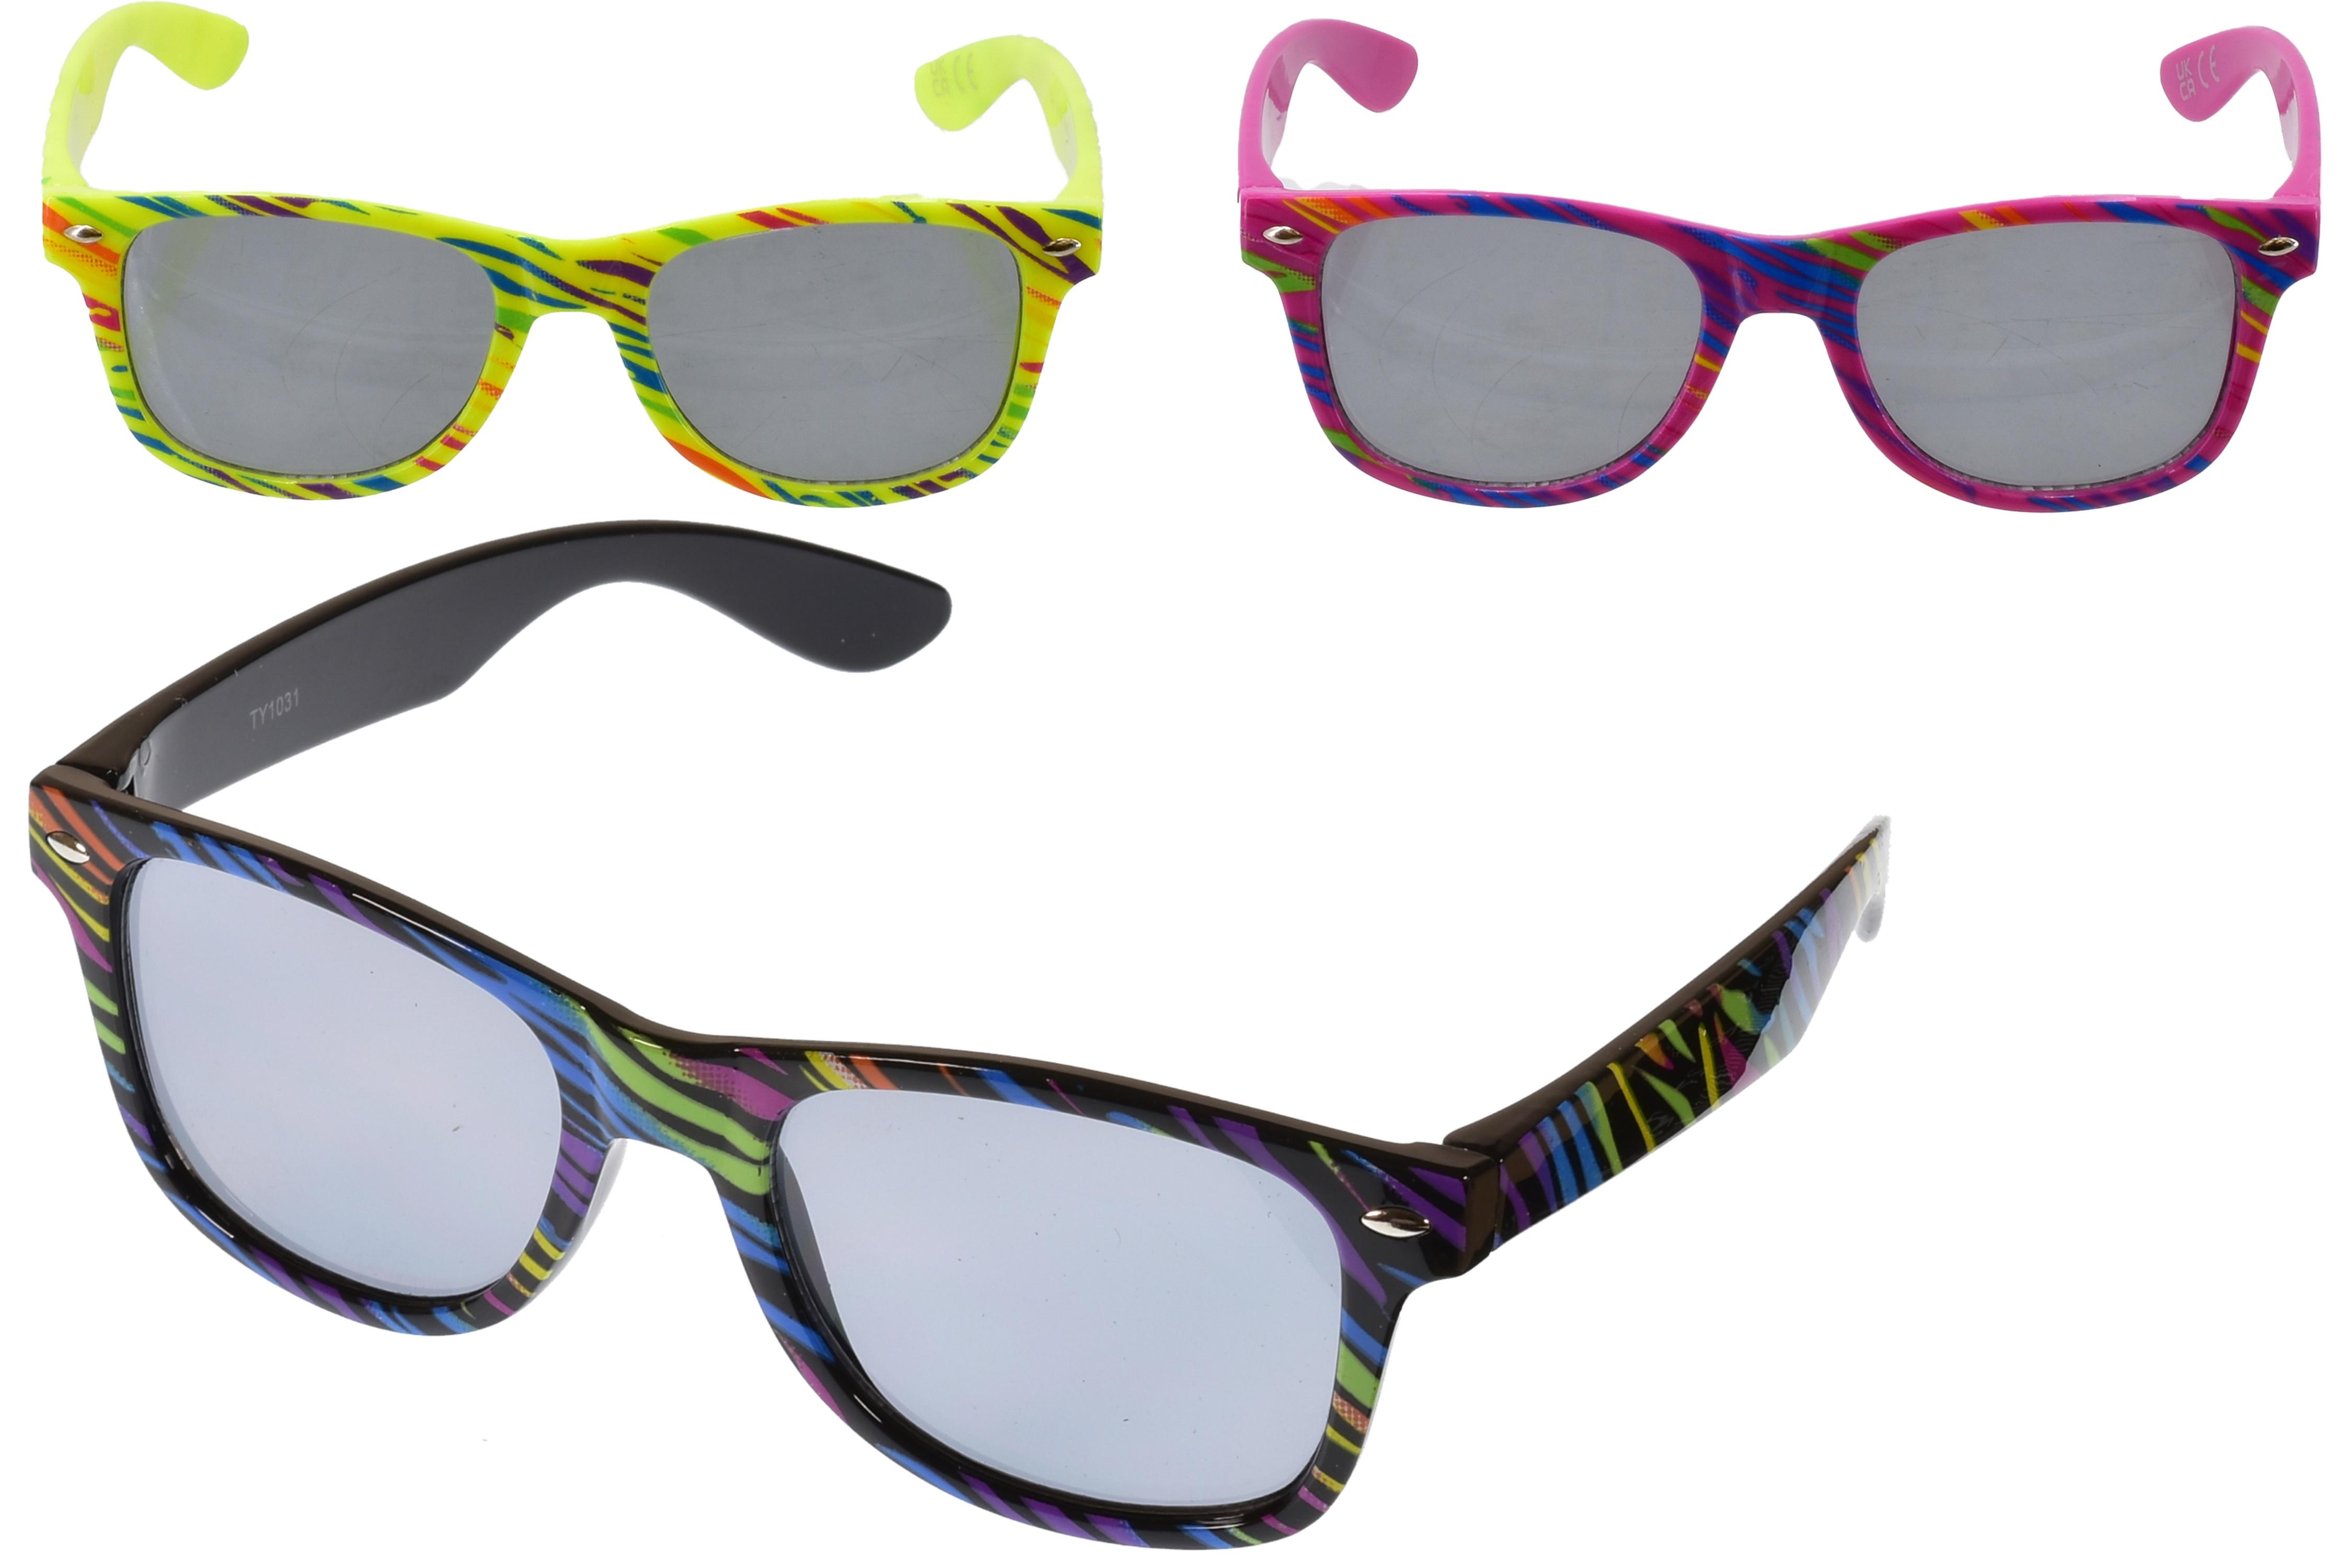 Kids Plastic Printed Frame Wayfarer Sunglasses (3 Asst)